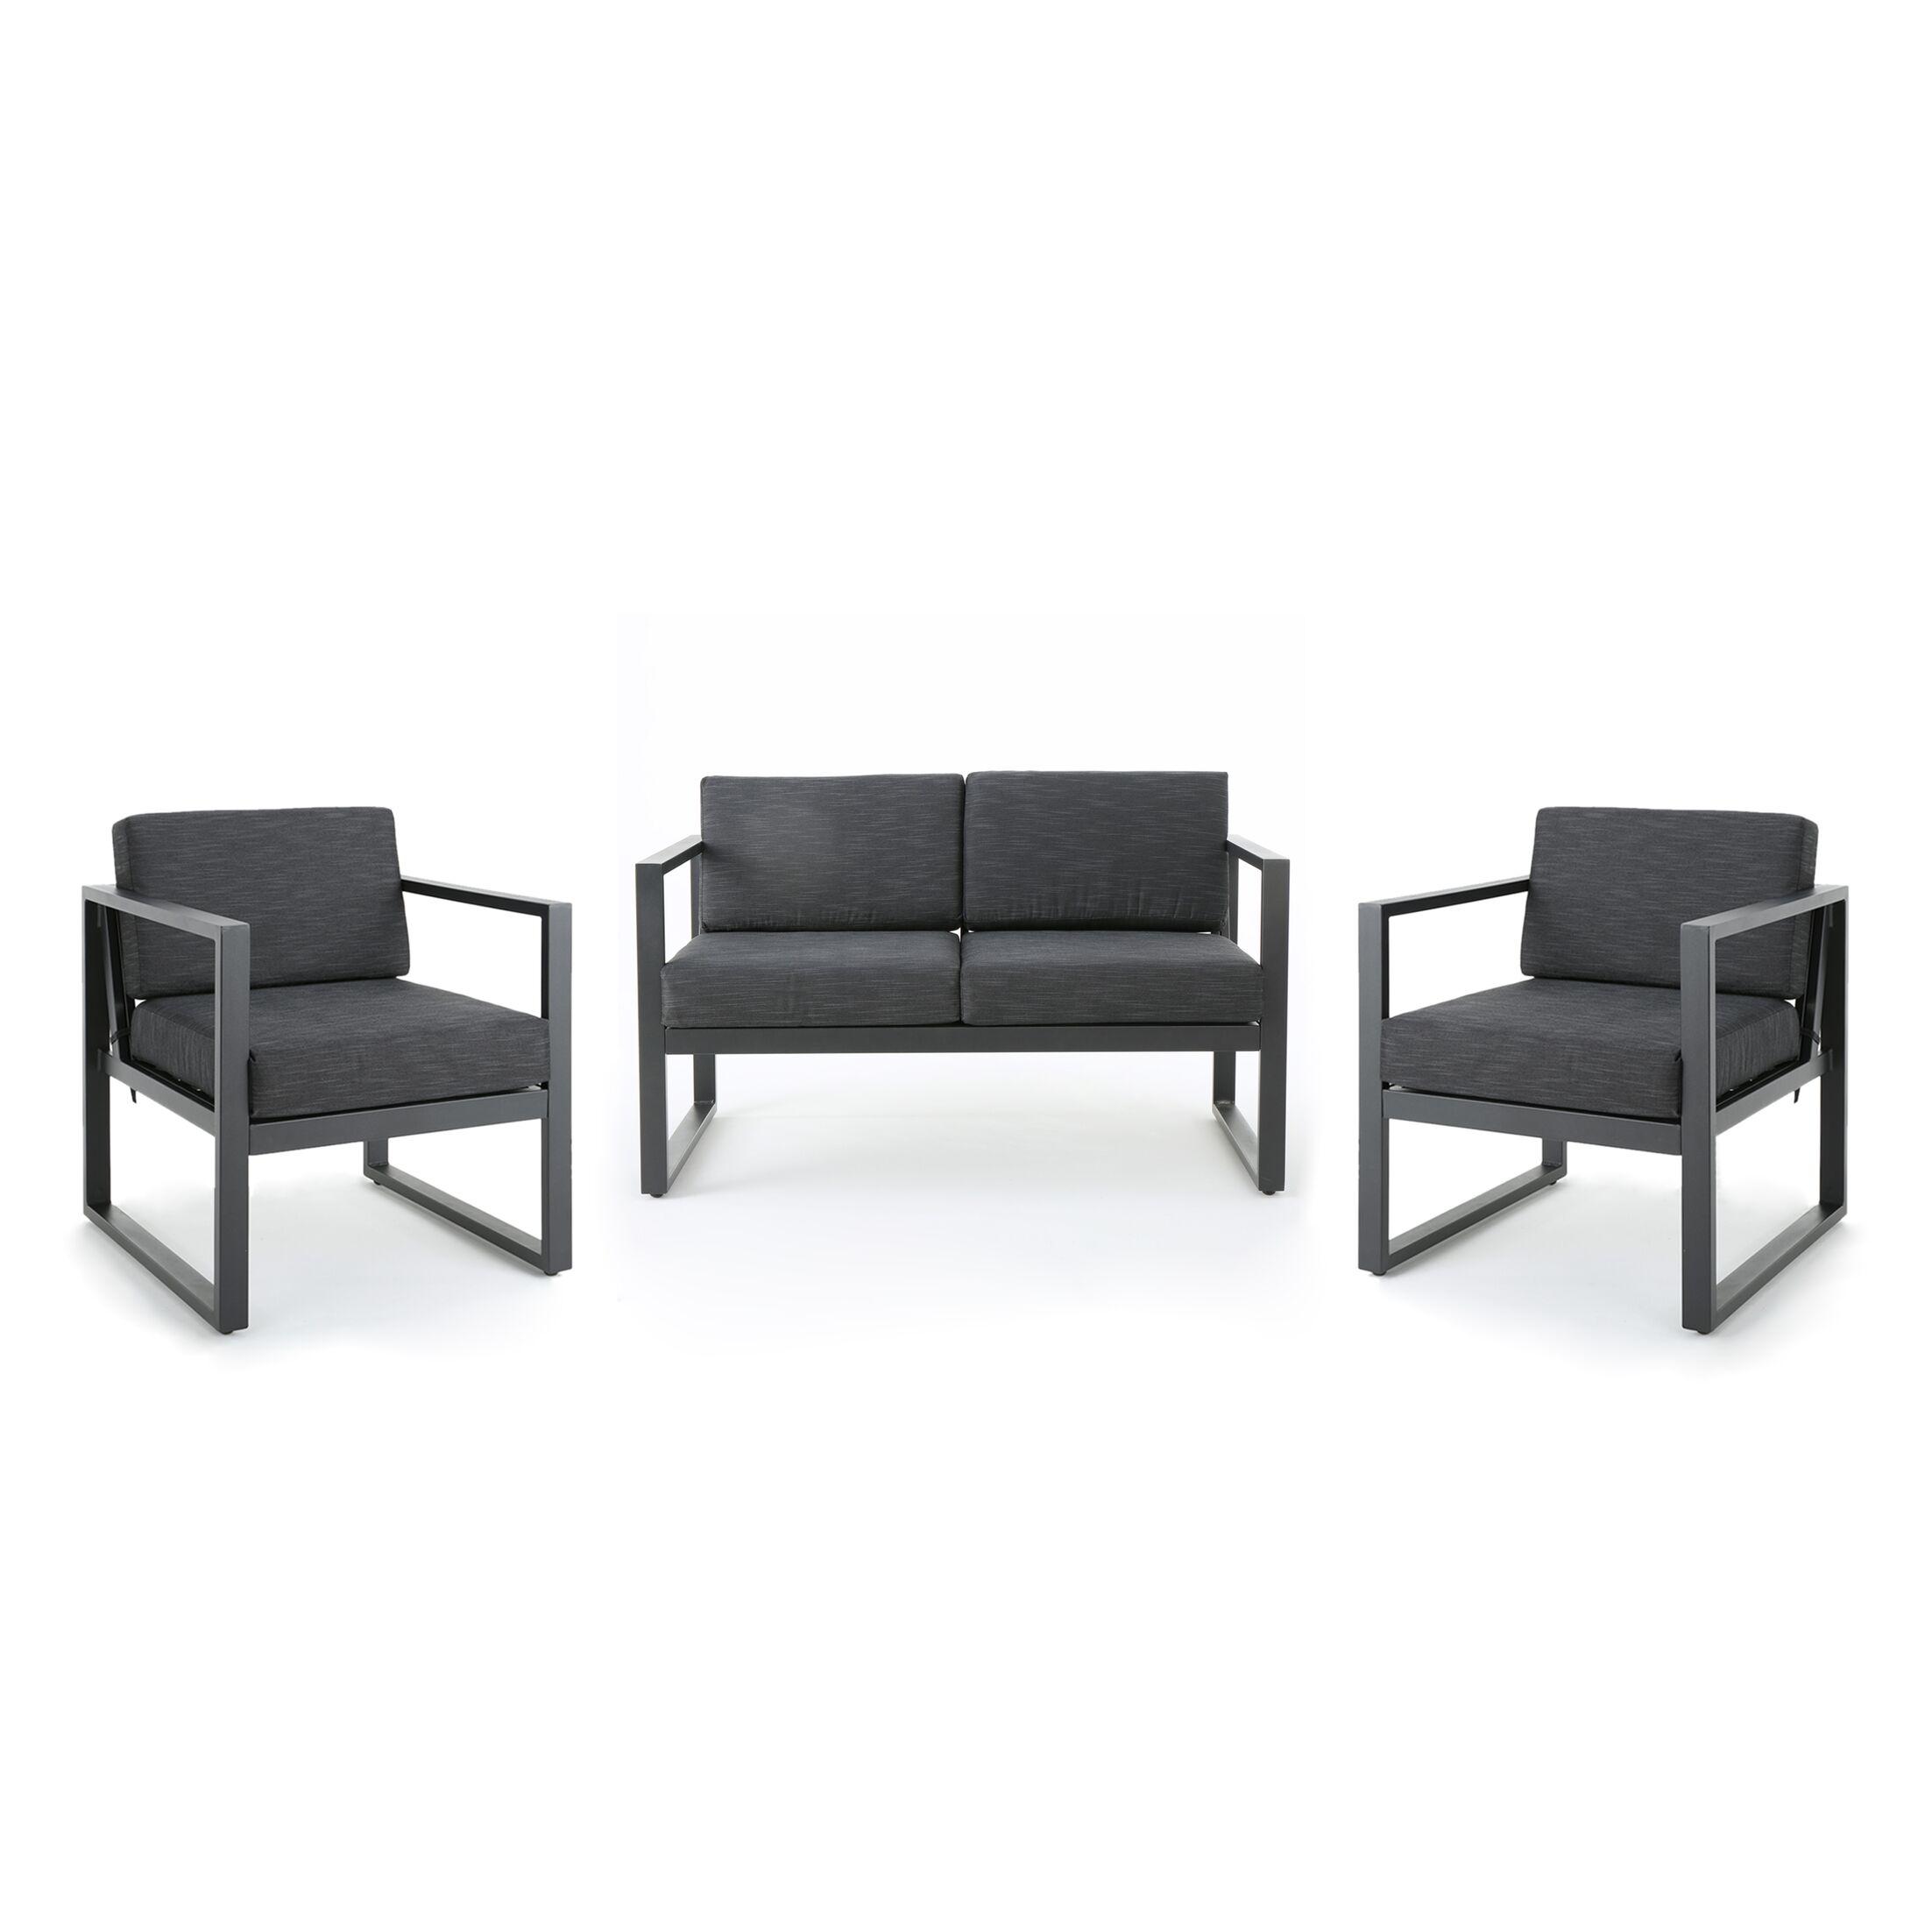 Eckenrode 3 Piece Conversation Set with Cushion